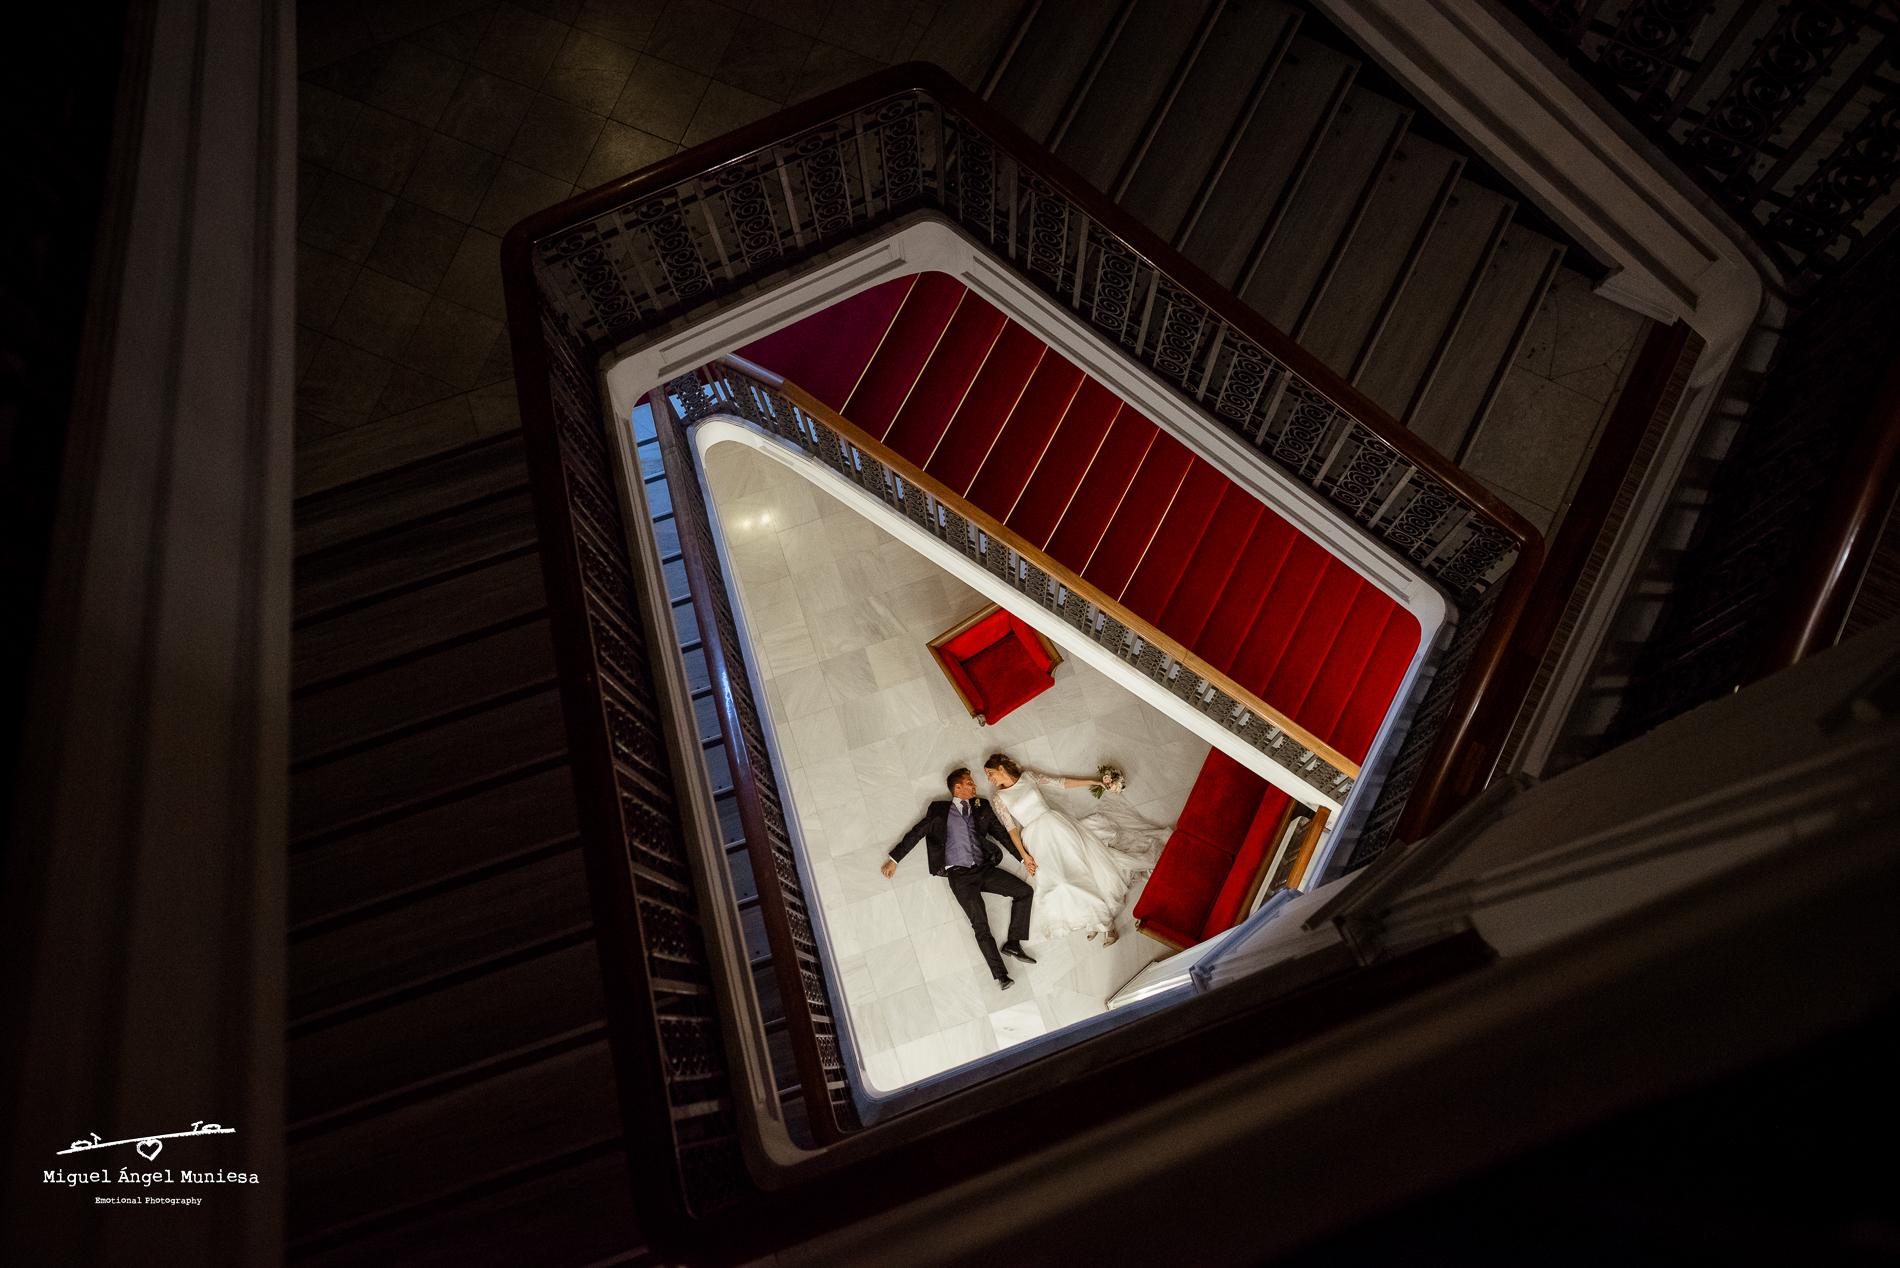 miguel angel muniesa, fotografo boda Teruel, fotografo boda navarra, fotografo boda zaragoza, fotografo boda soria, miguel angel muniesa emotional photography_01